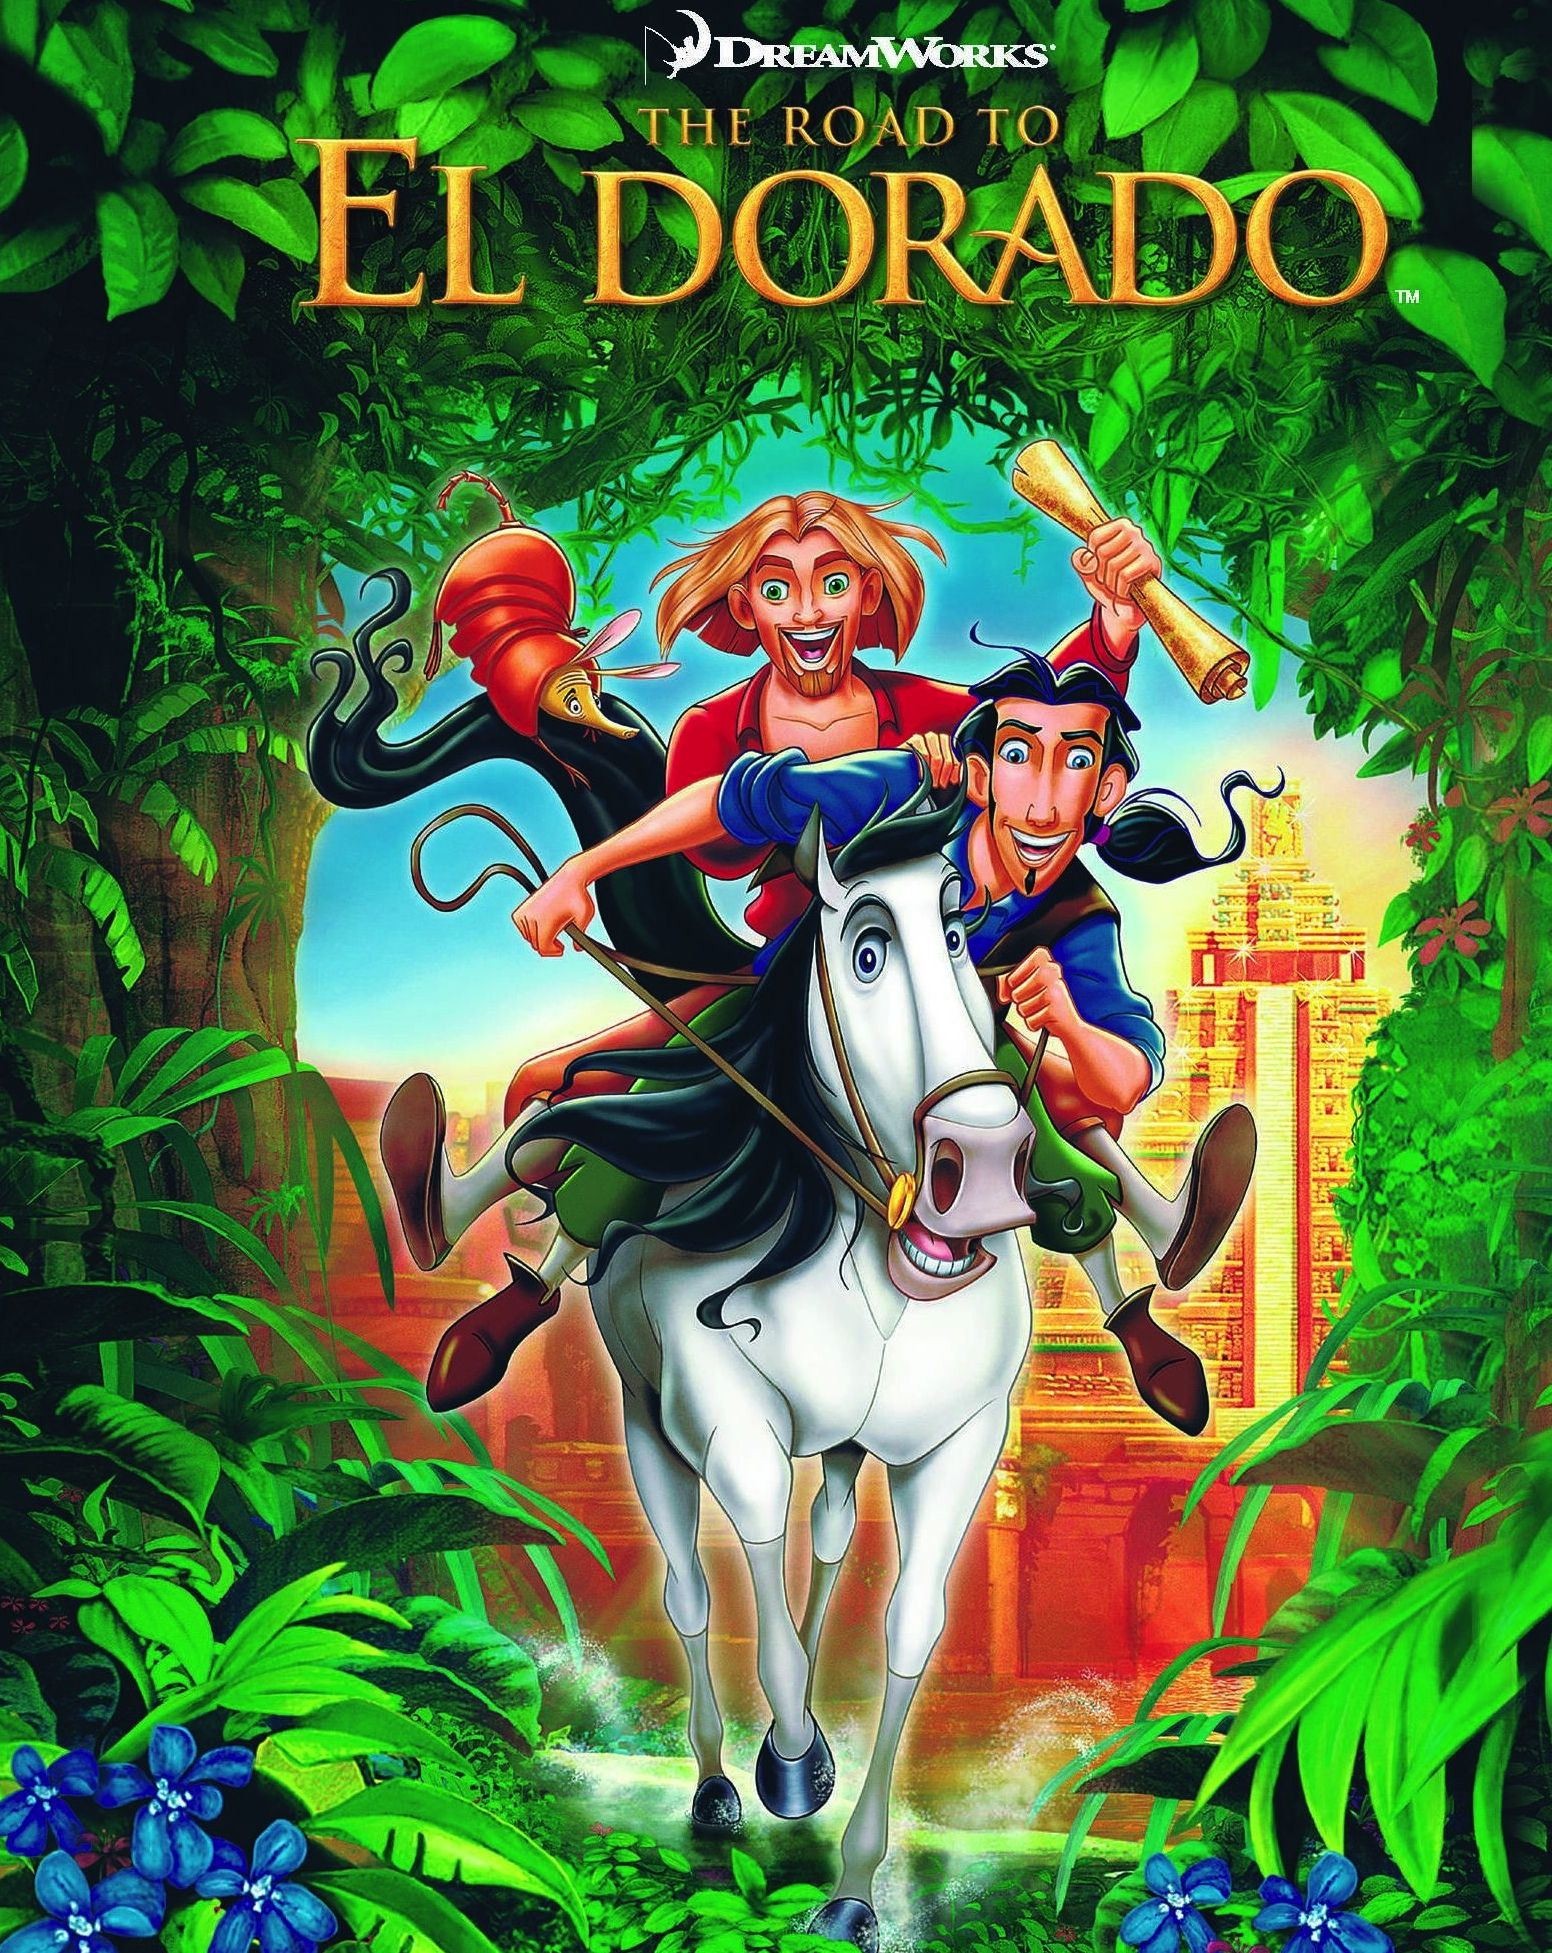 Lol, funny, short buddy movie. D Animated movies, El